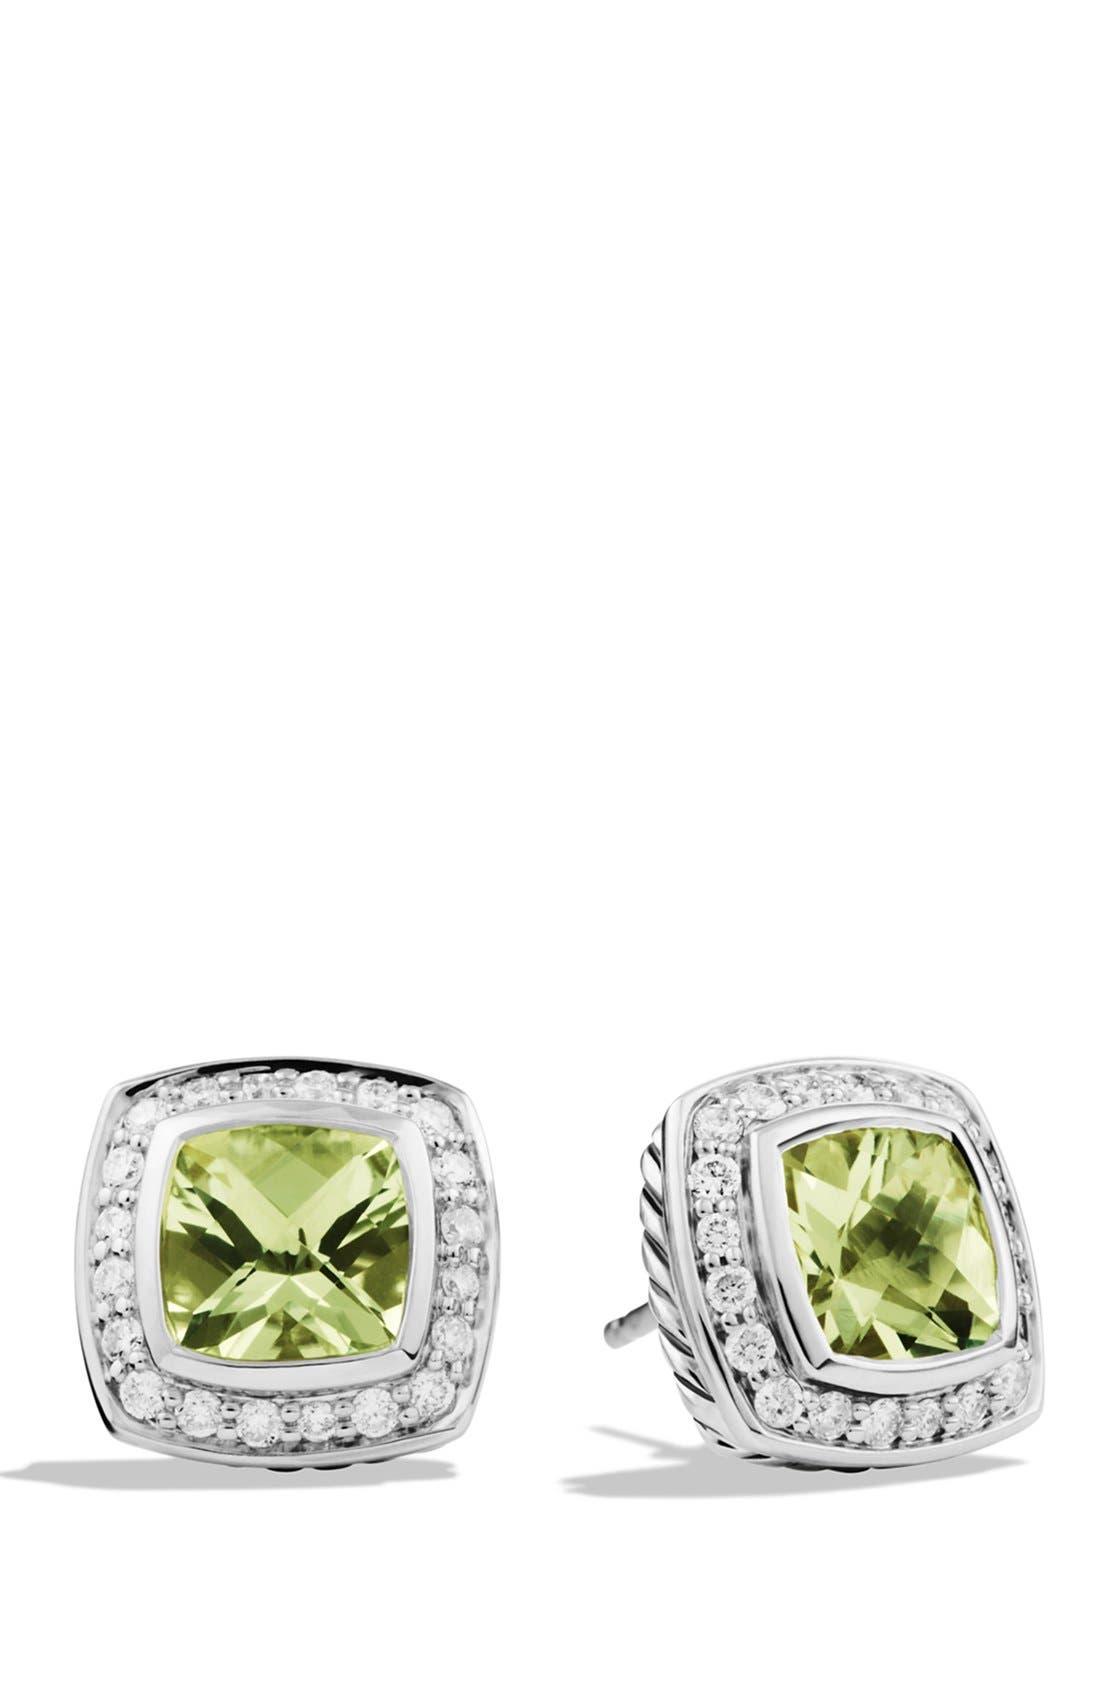 David Yurman 'Albion' Petite Earrings with Semiprecious Stones & Diamonds